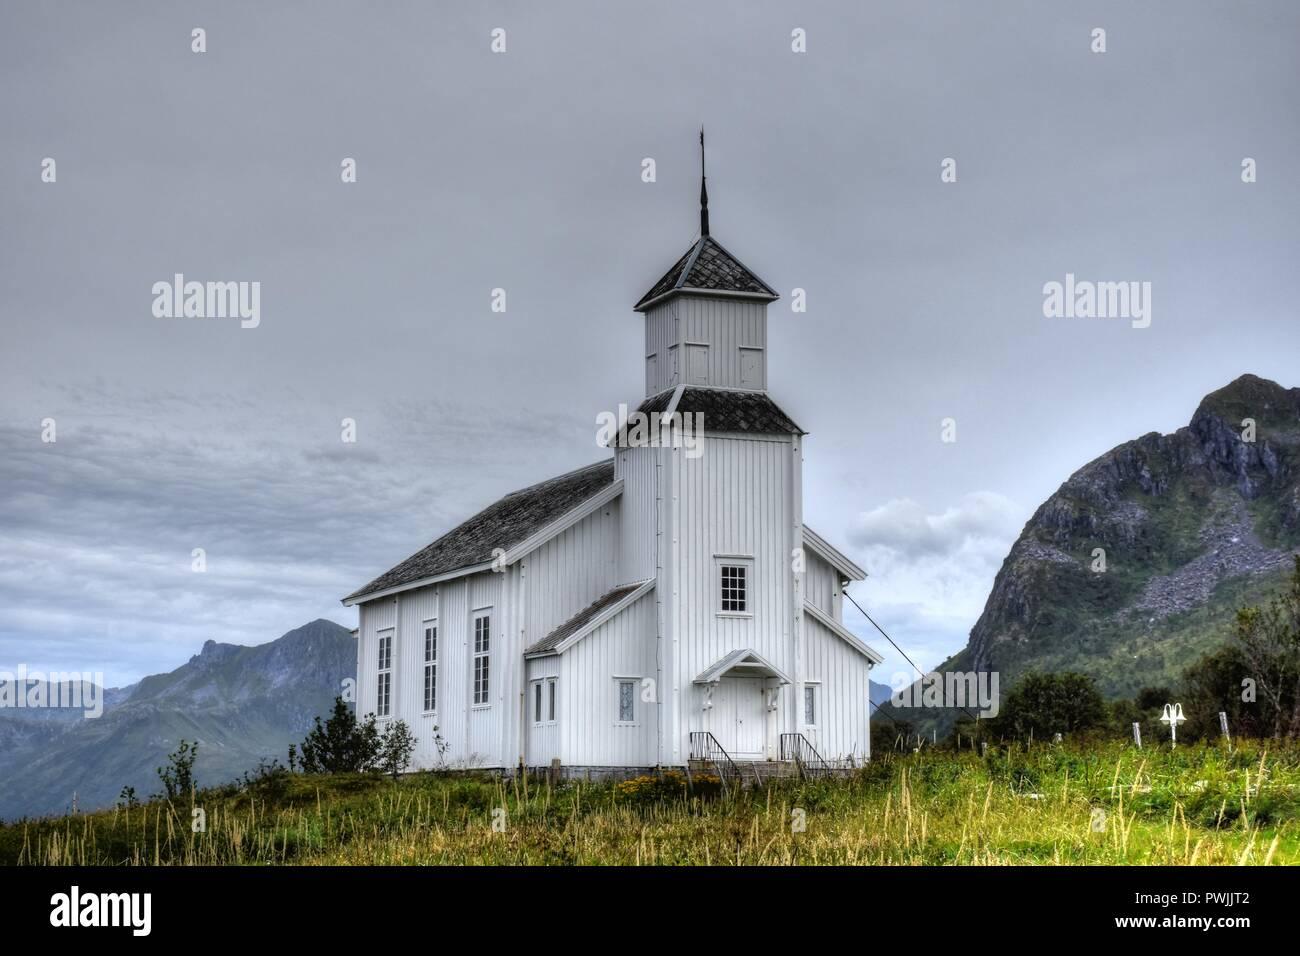 Norwegen, Lofoten, Gimsøy, Gimsøy Kirke, Kirche, Friedhof, Gimsøya, Gimsøystraumen, Fjord, Vinjevika, Sandmannen, Insel, Kreuz, Grabkreuz, Gottesacker Stock Photo